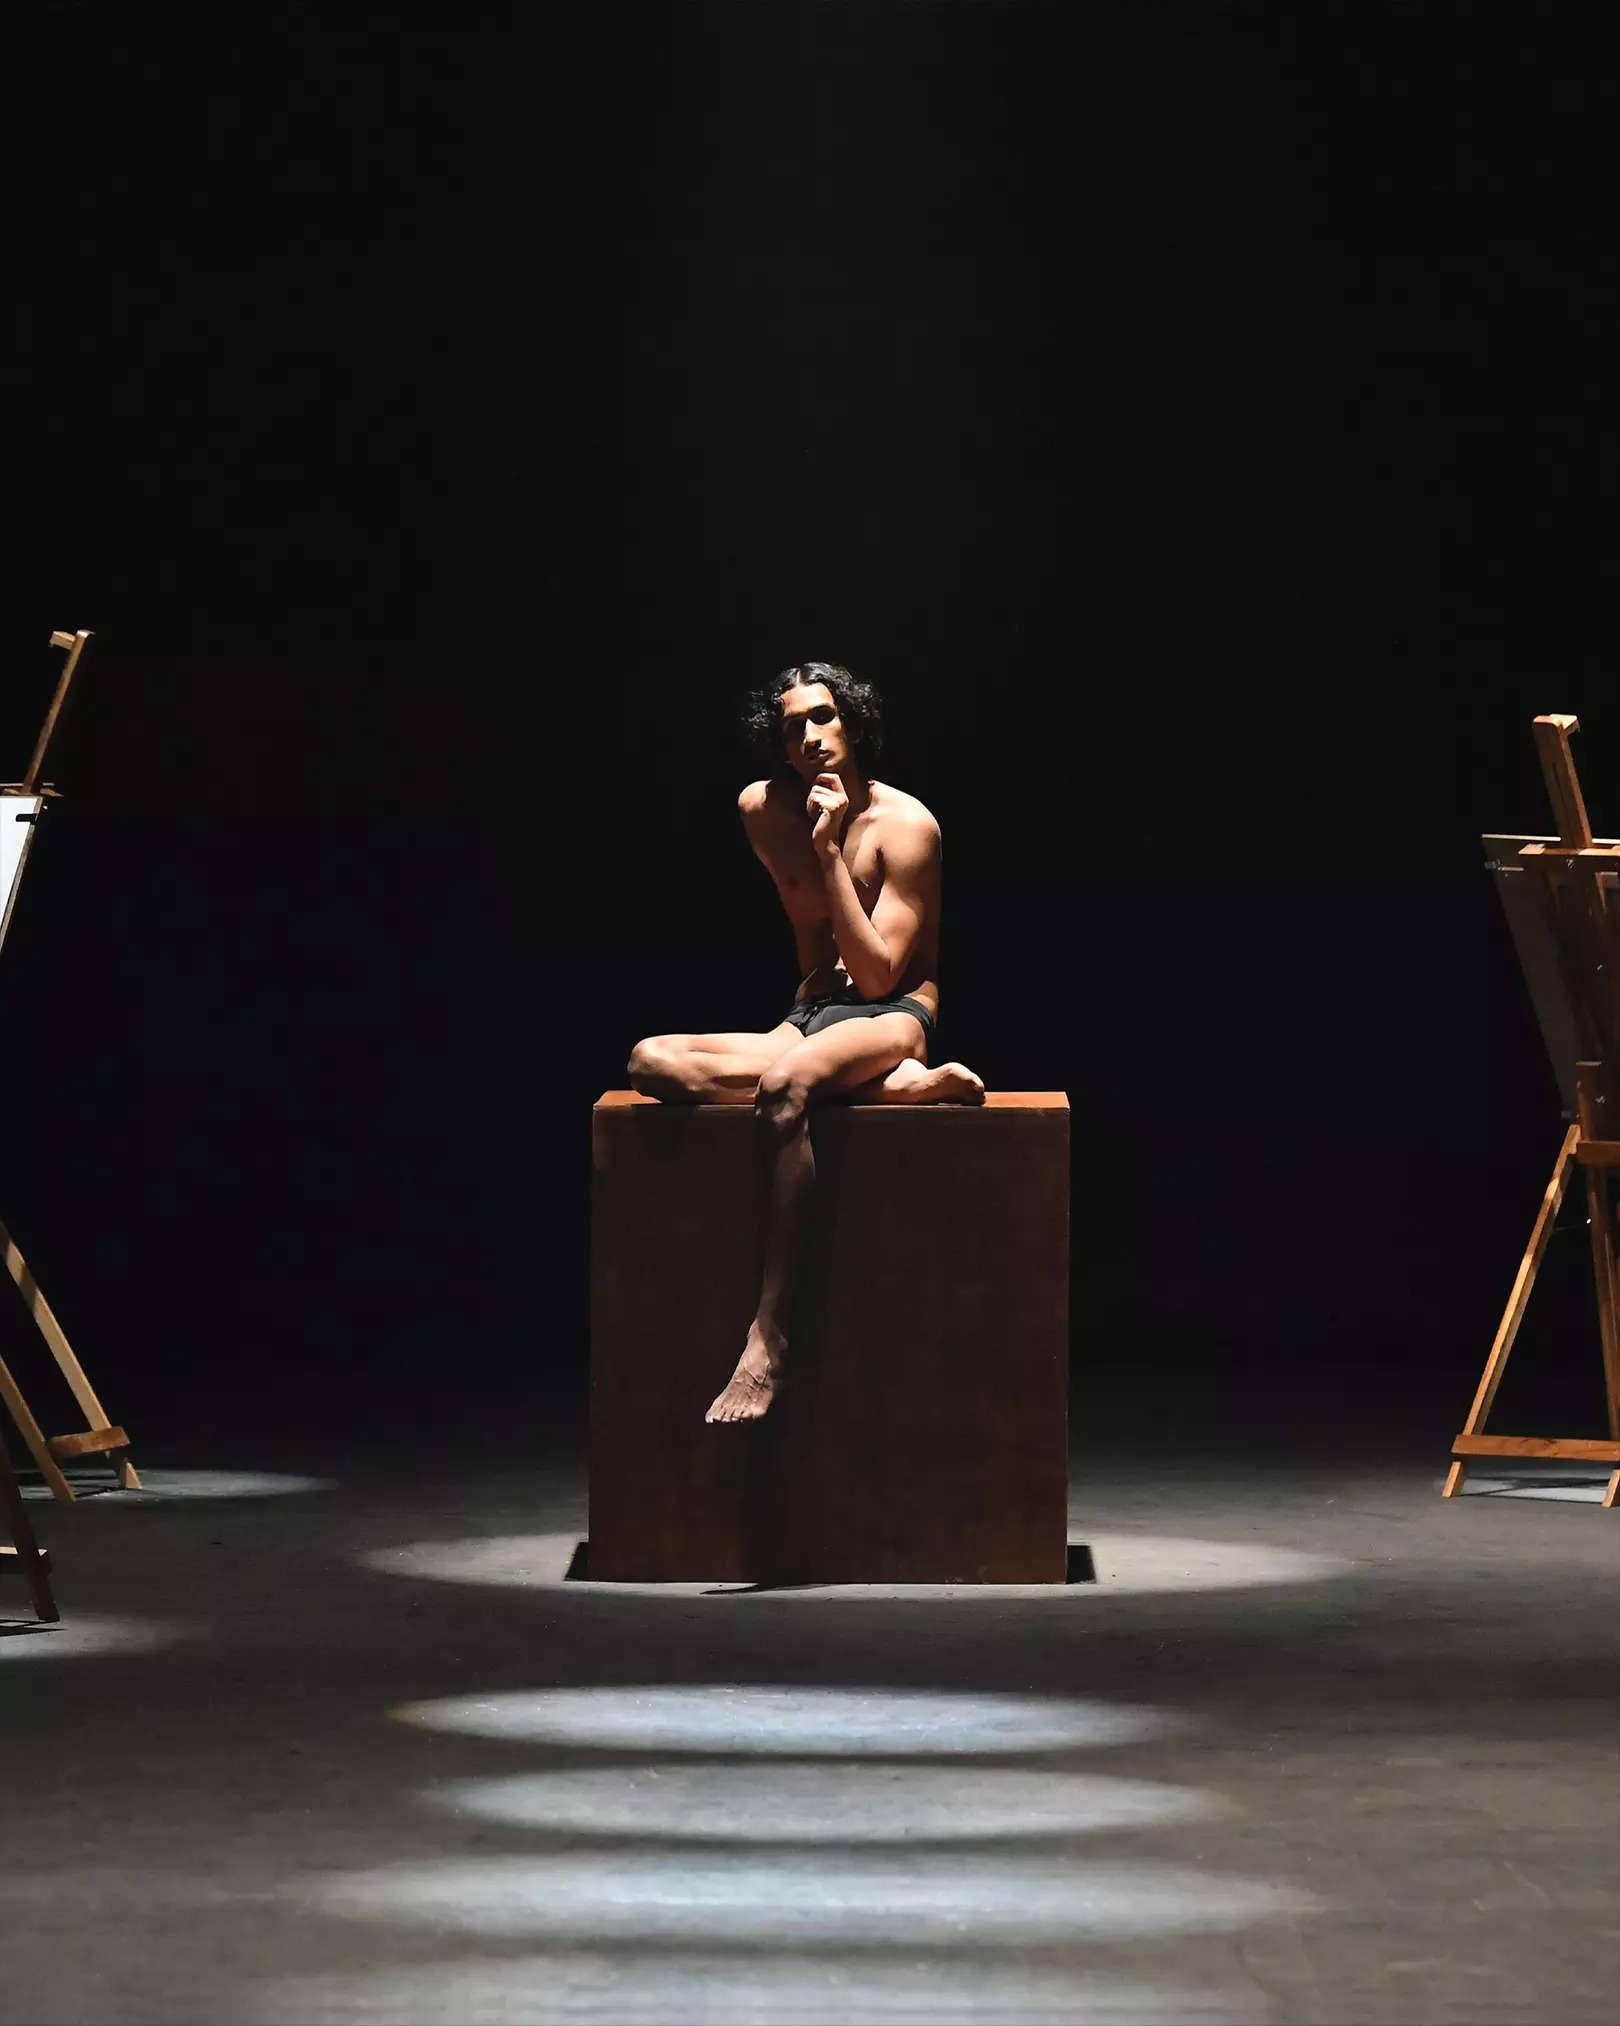 SHIVAN & NARRESH COUTURE SERIES 1 - ARTISTS AT WORK (b)